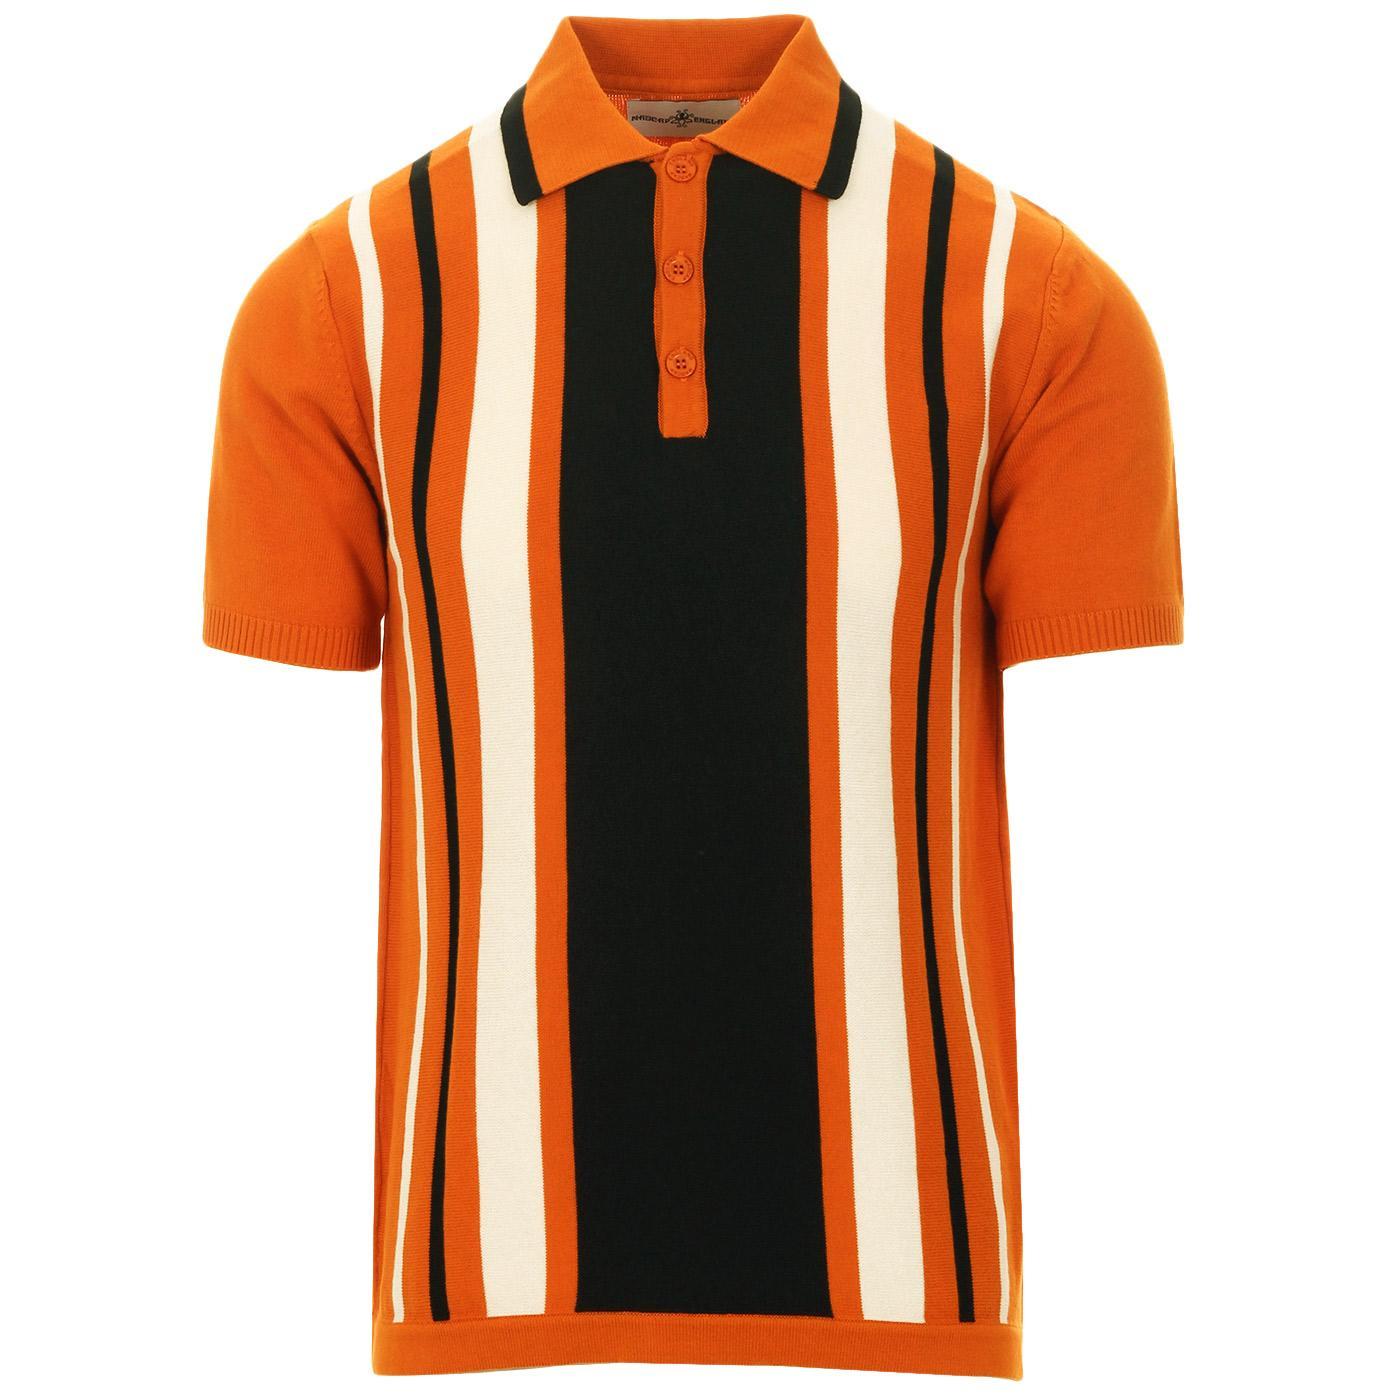 Folklore MADCAP ENGLAND Mod Stripe Knit Polo (MO)